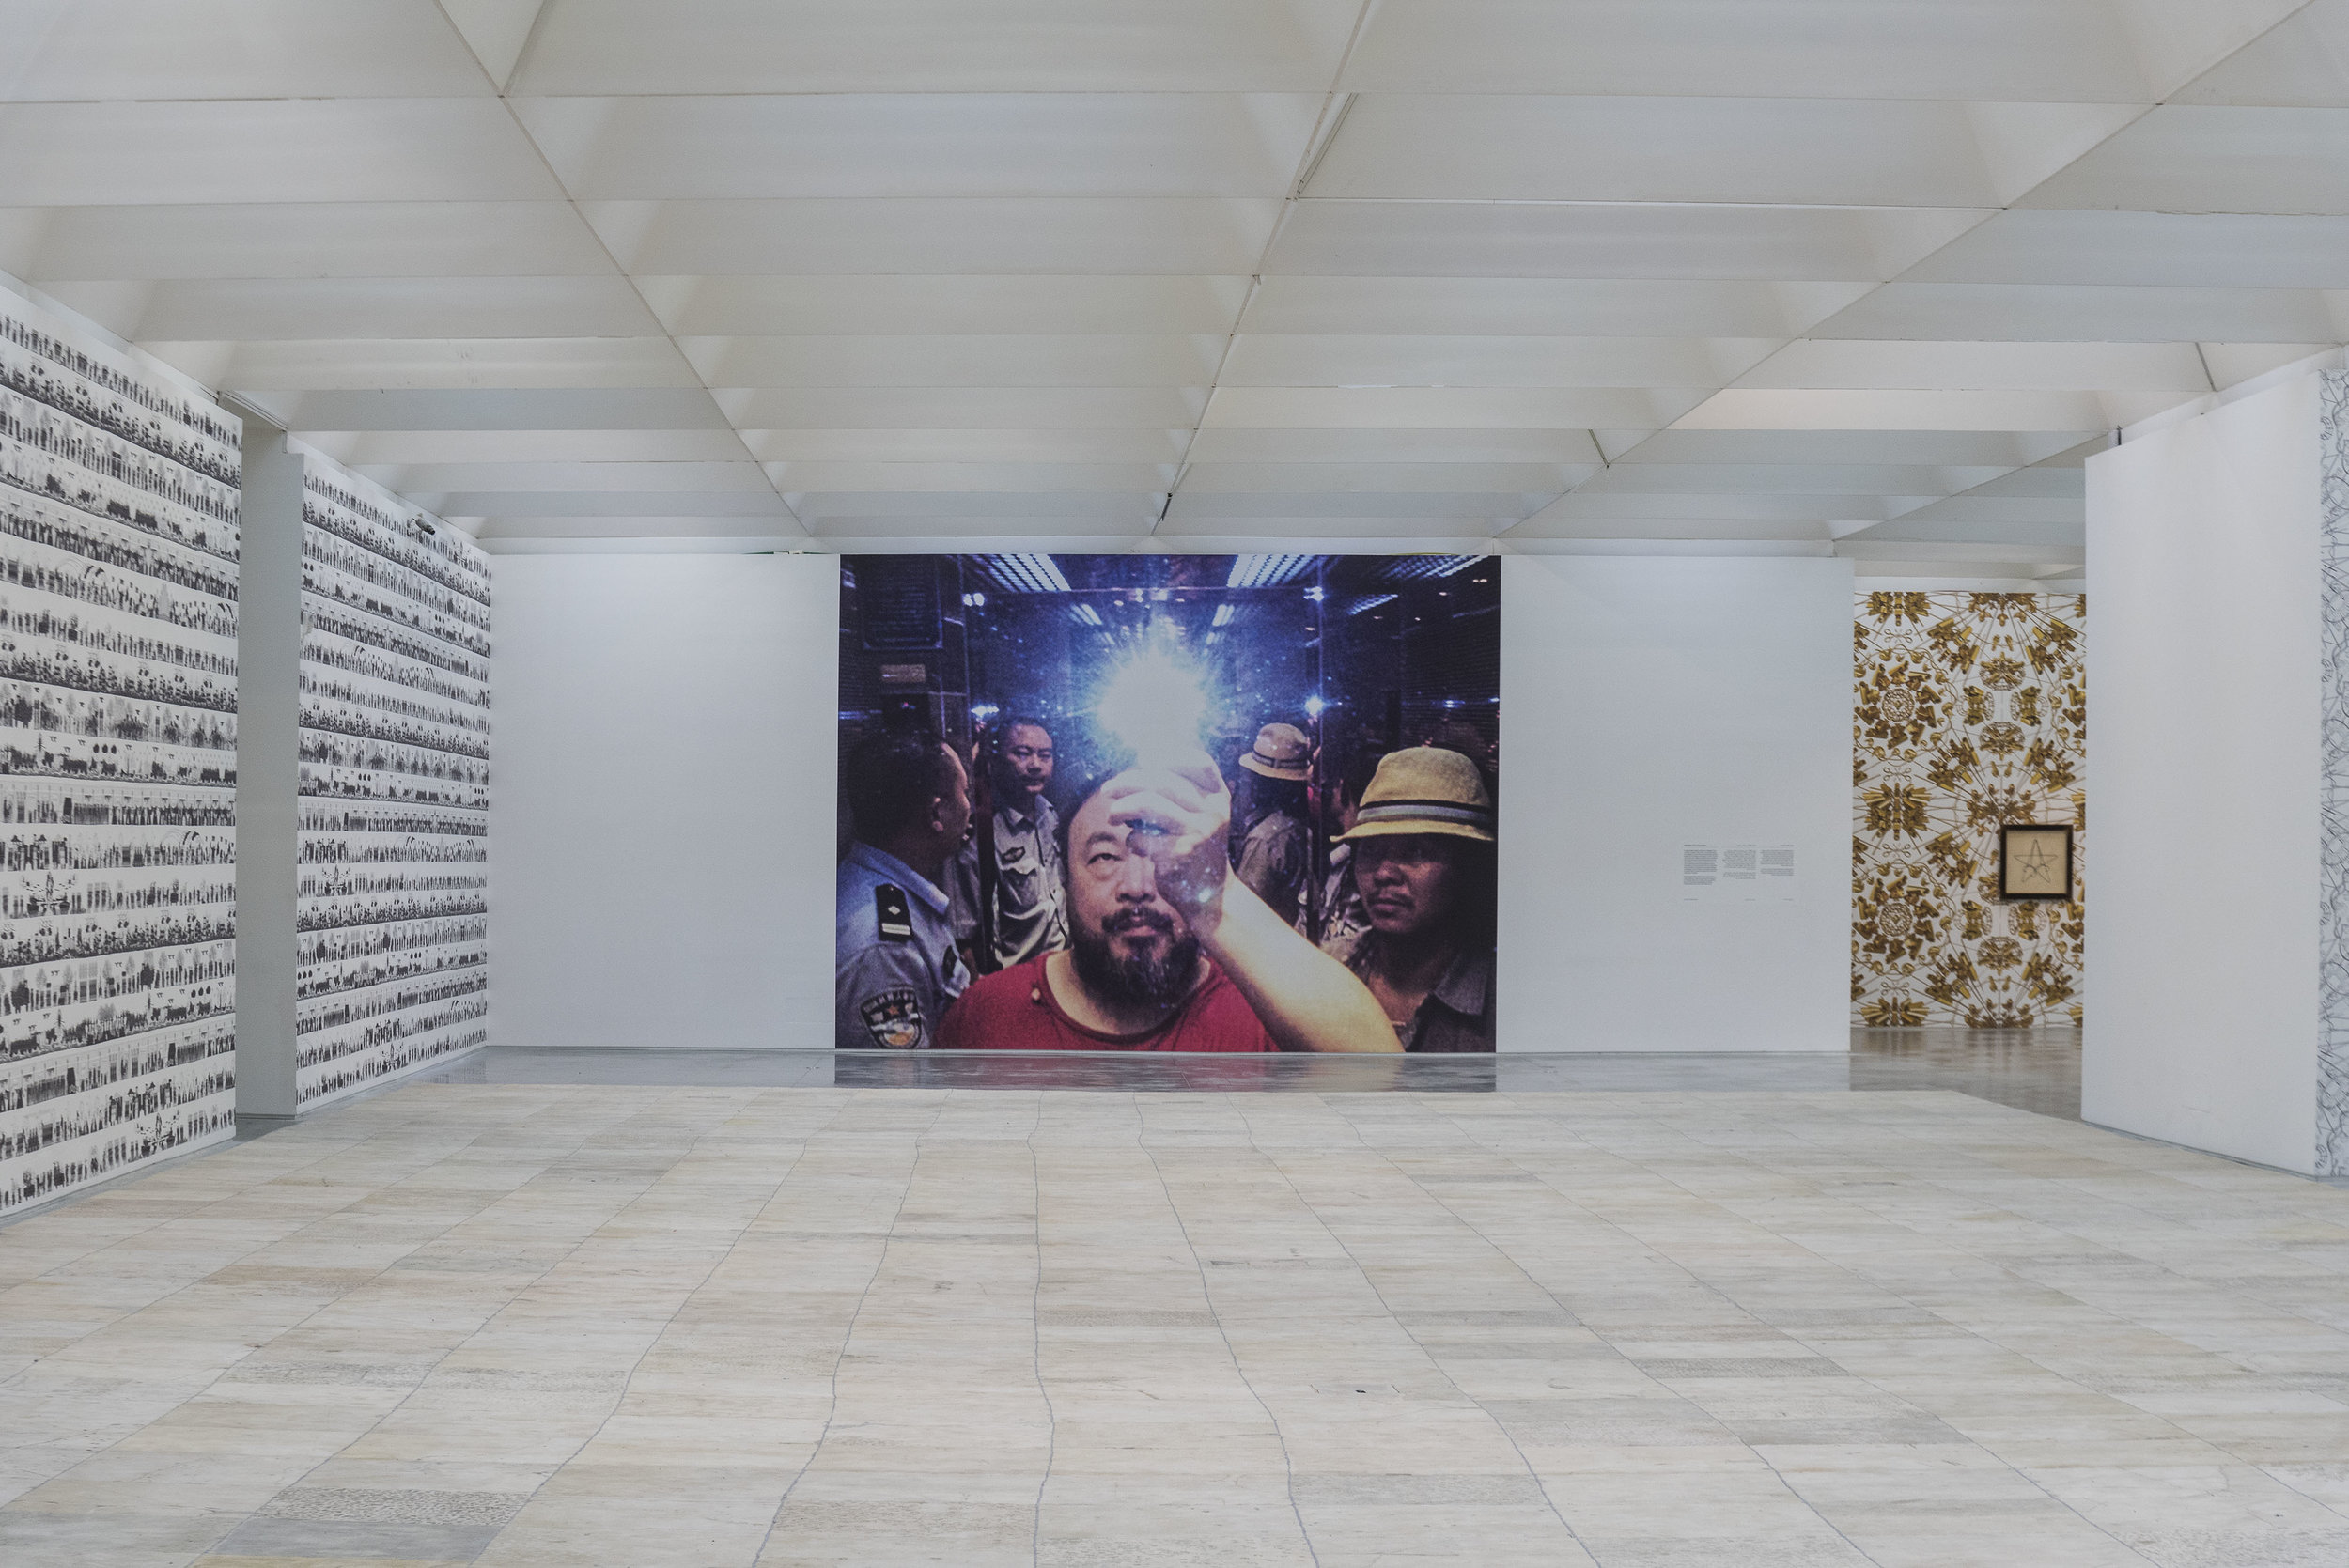 Exhibition view photo by Eli Posner